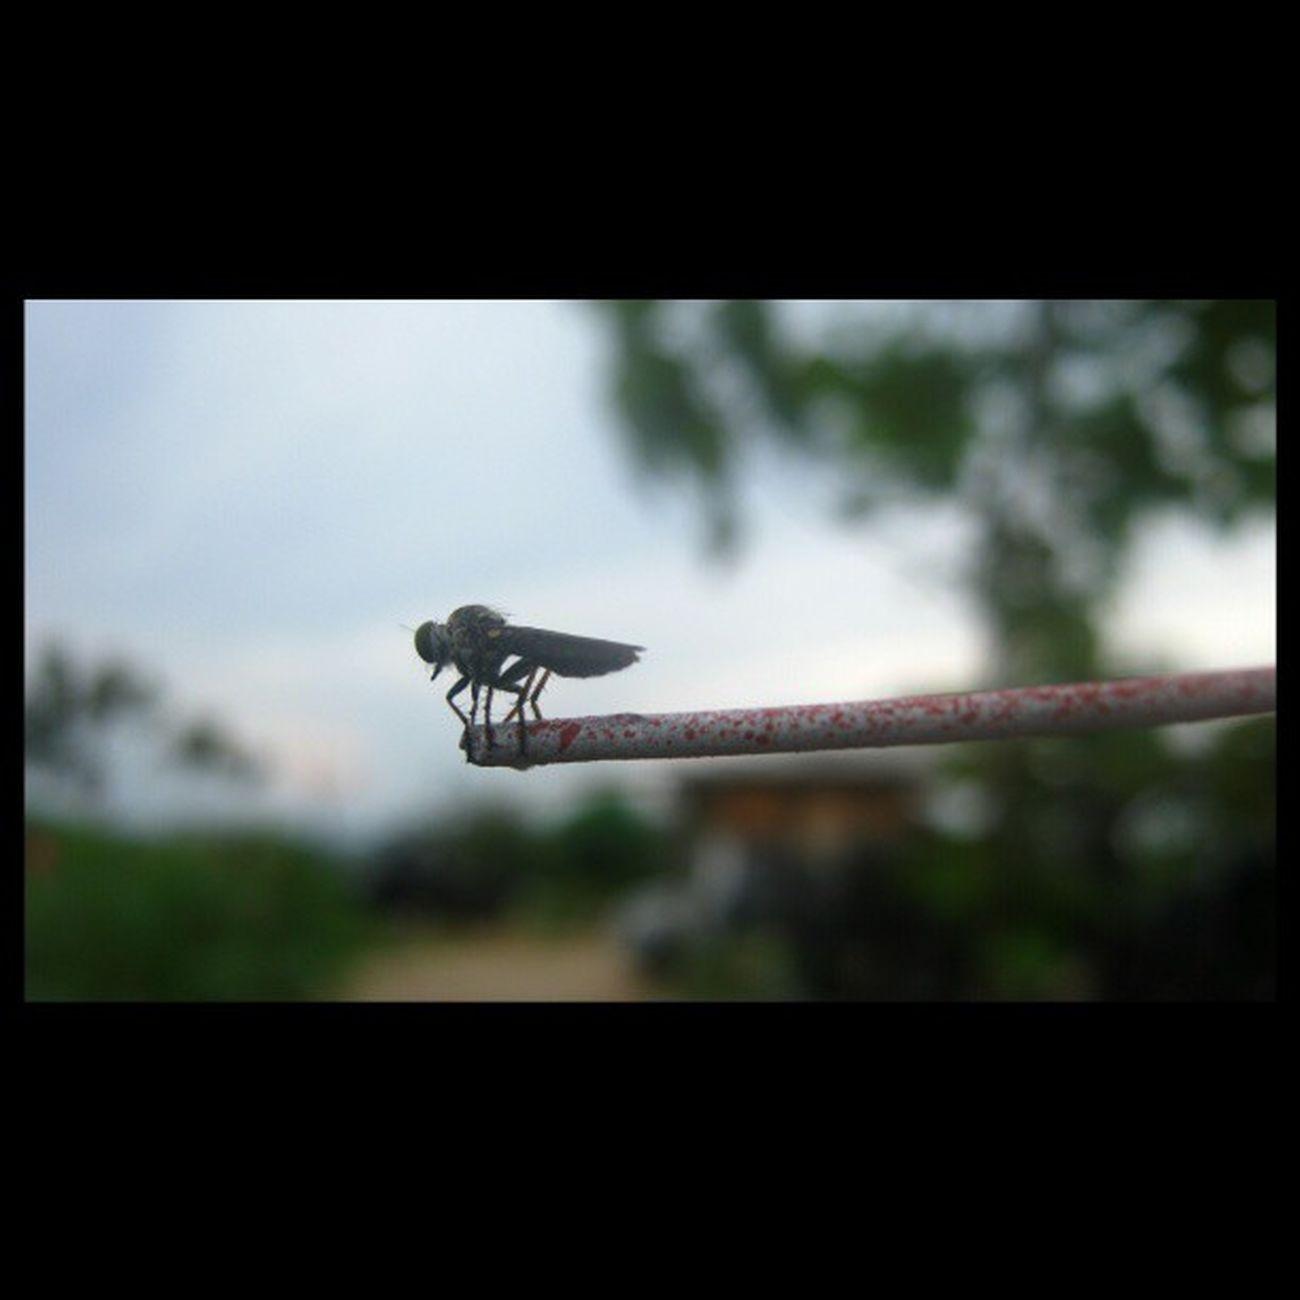 [ nyamuk ] Insecta Insectagram Igelinesia INDONESIA instanusantara indonesia_nature_lover instanusantaranature instaanimal instagood picoftheday photooftheday webstagram statigram waykanan lampung igelinesia nature natureskingdom